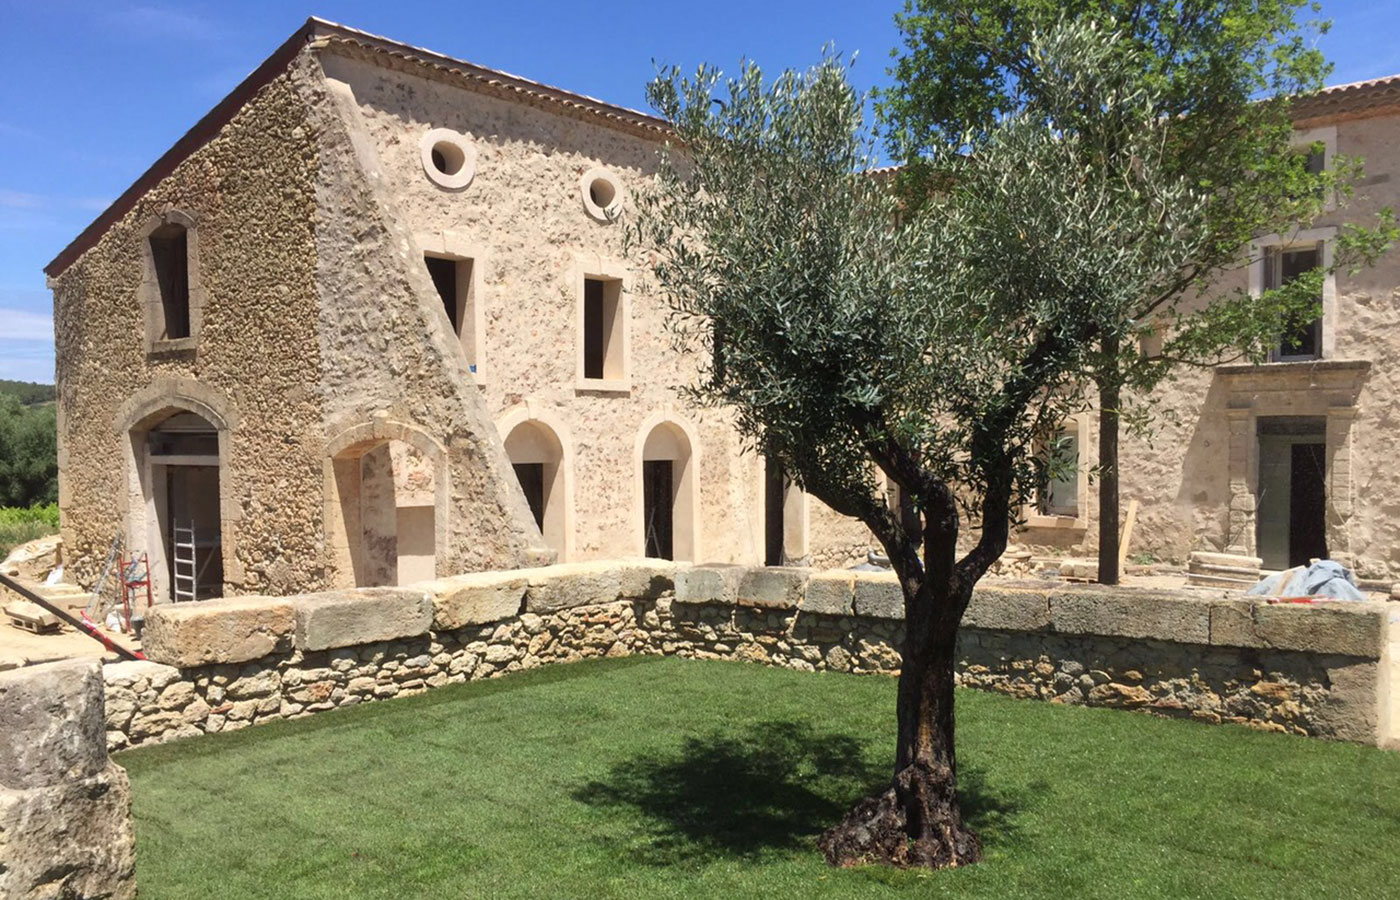 Mediterrane beplanting amazing project mediterrane villatuin in